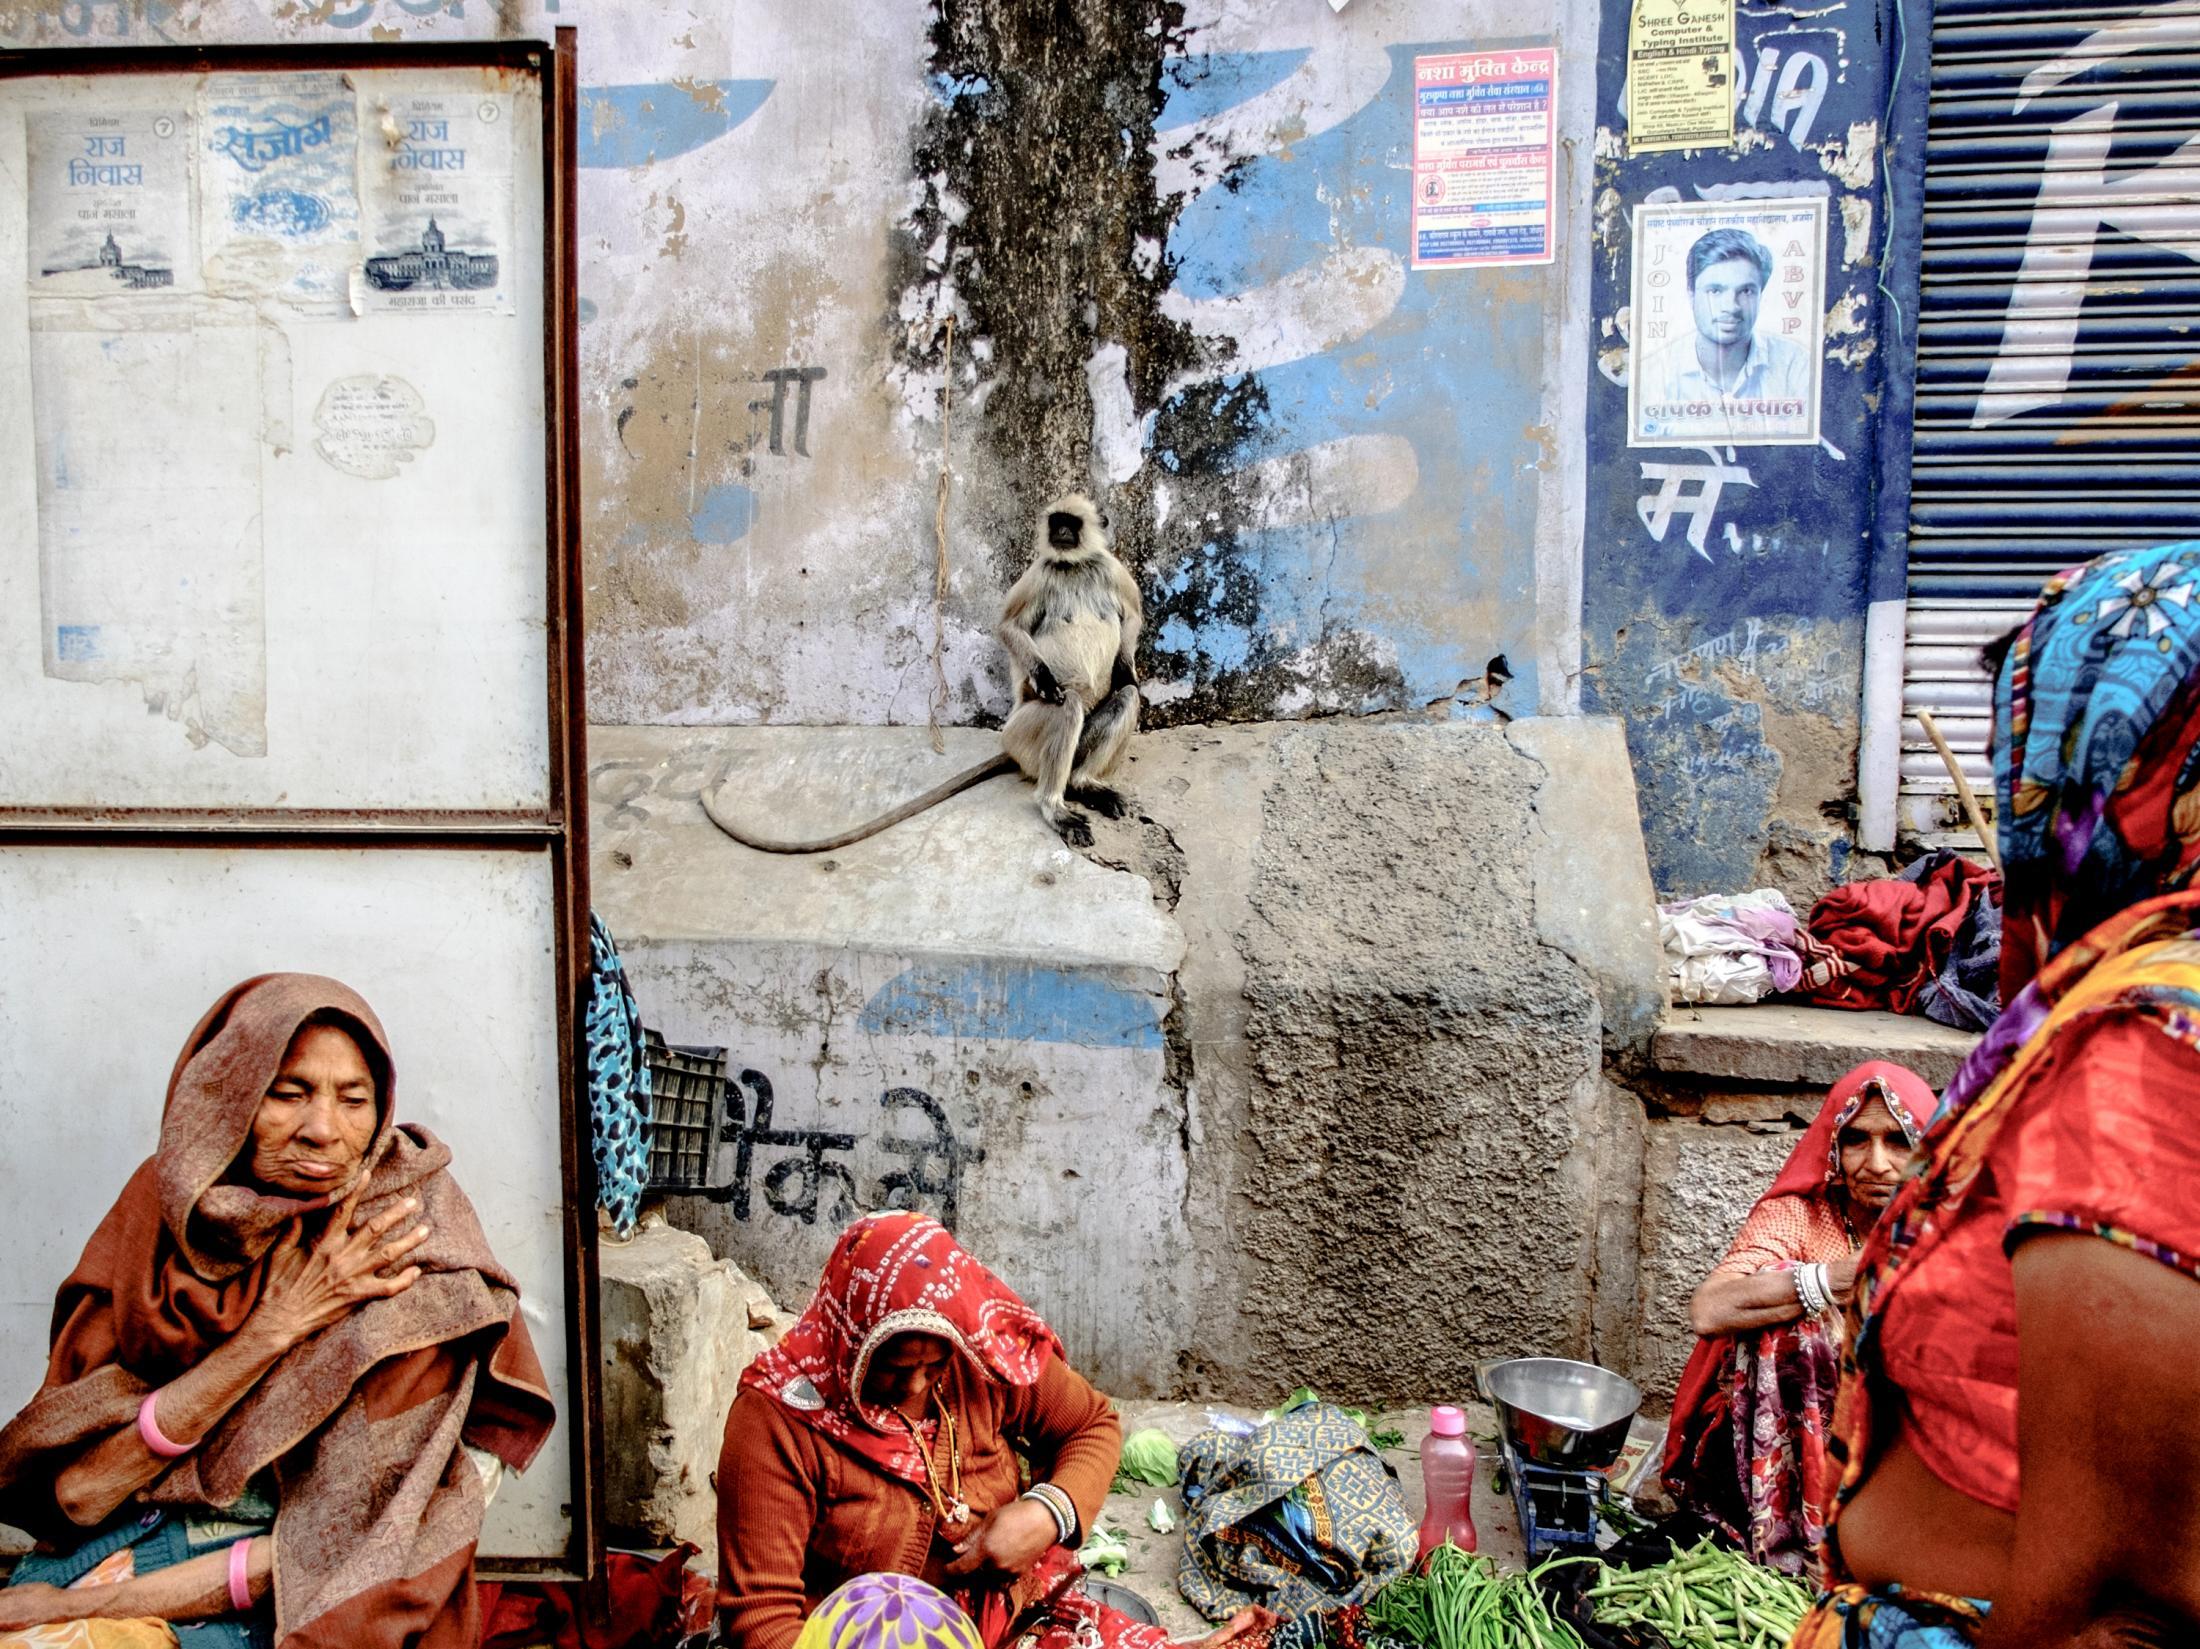 Pushkar, India 2017